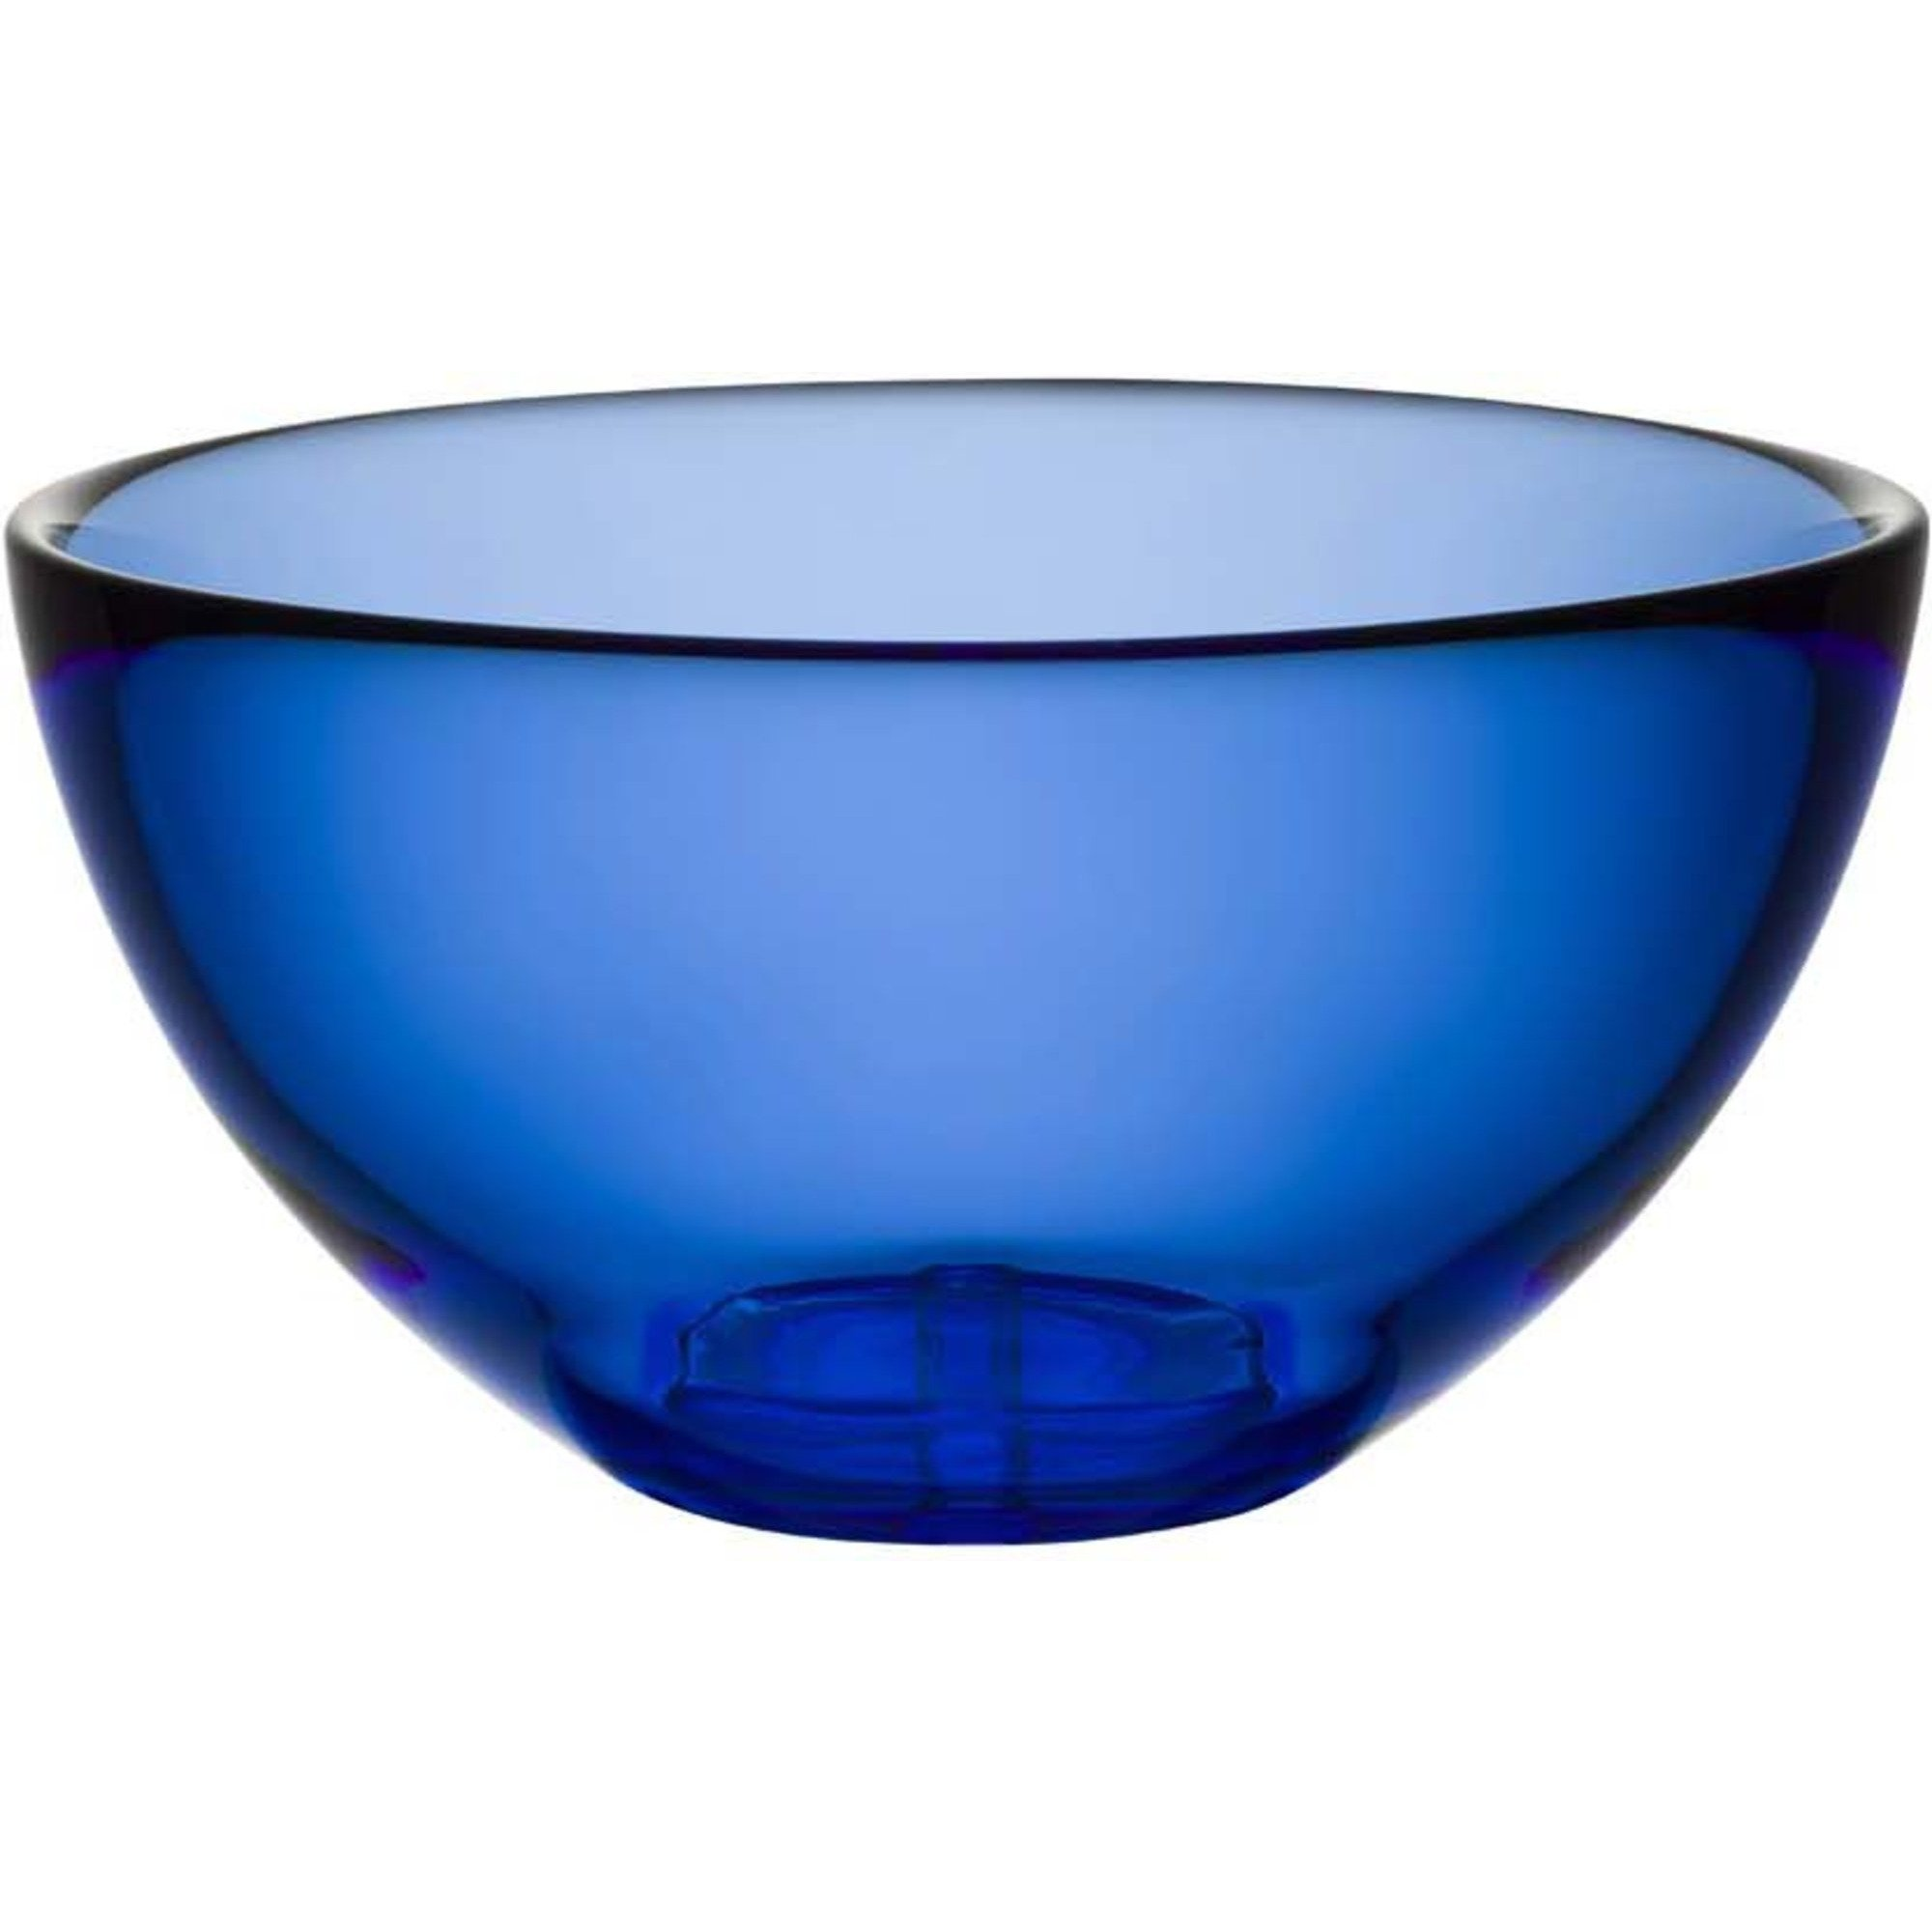 Kosta Boda Bruk Serveringsskål Water Blue Small